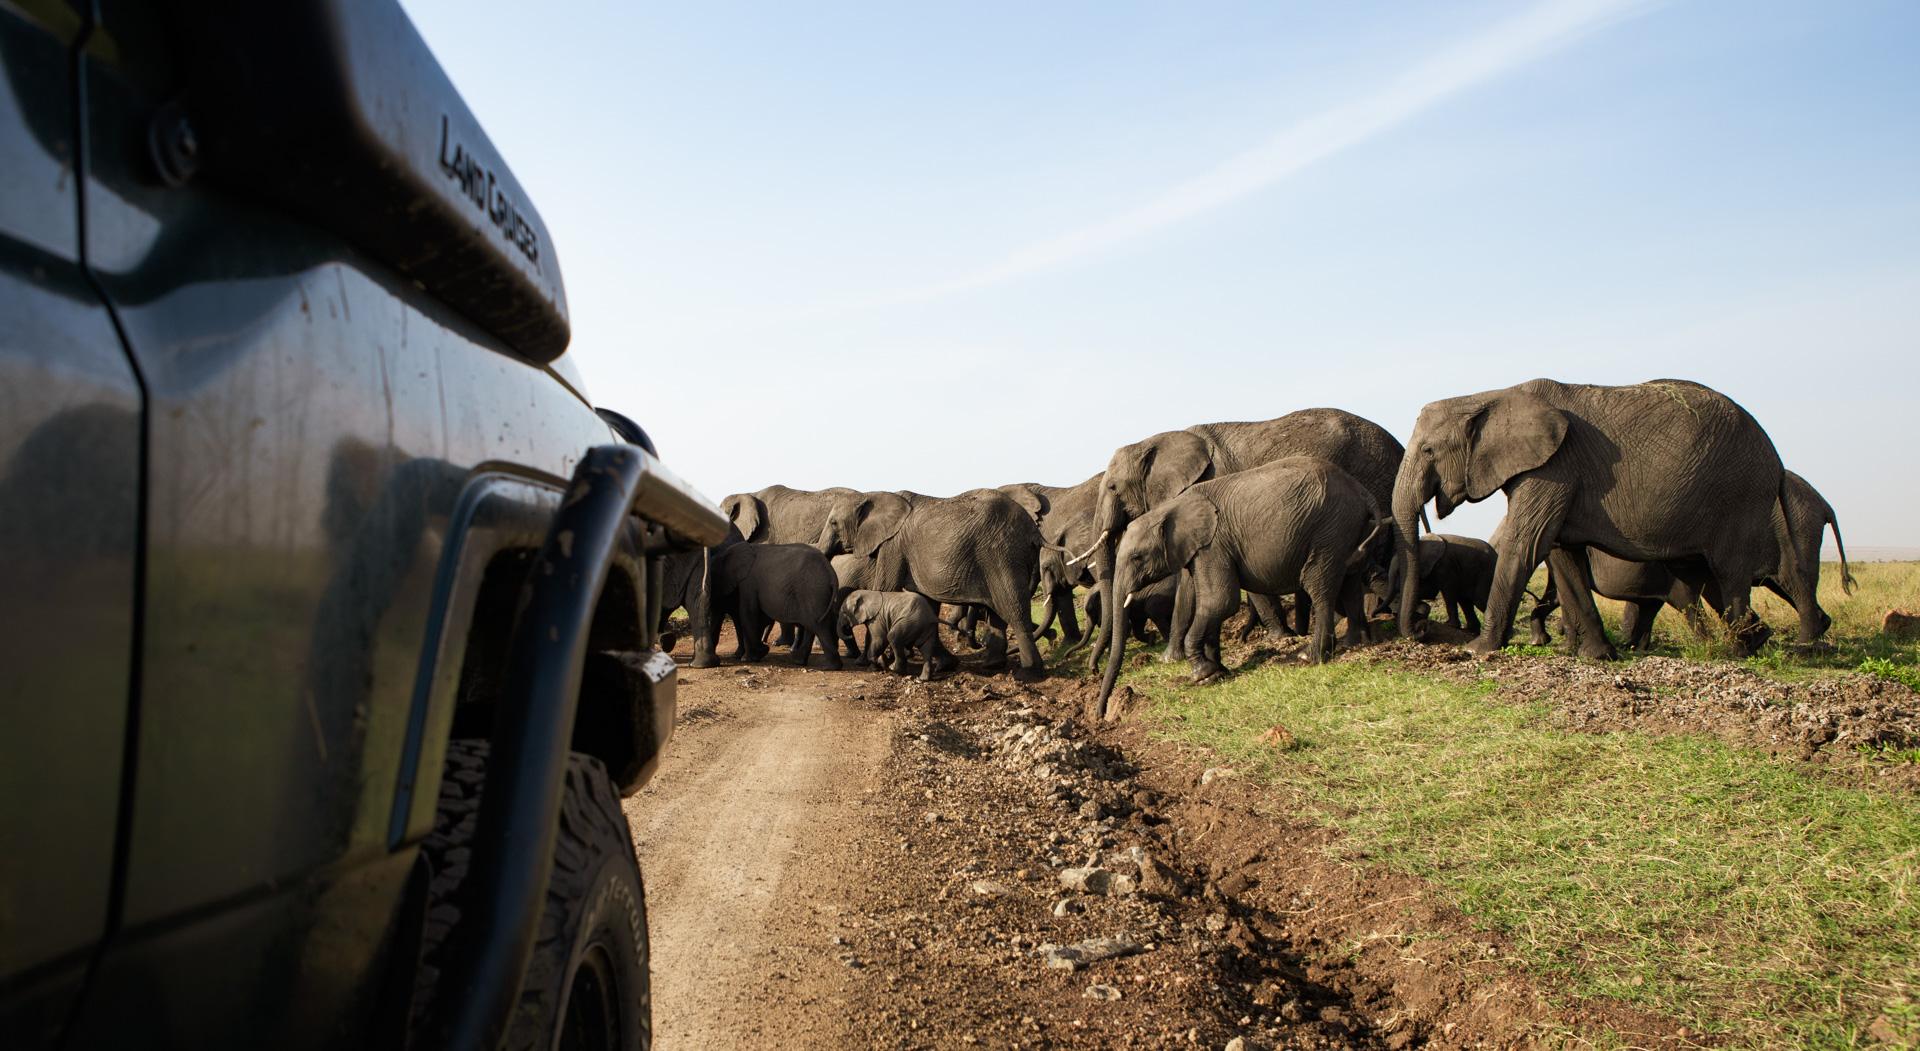 Elephants and Car